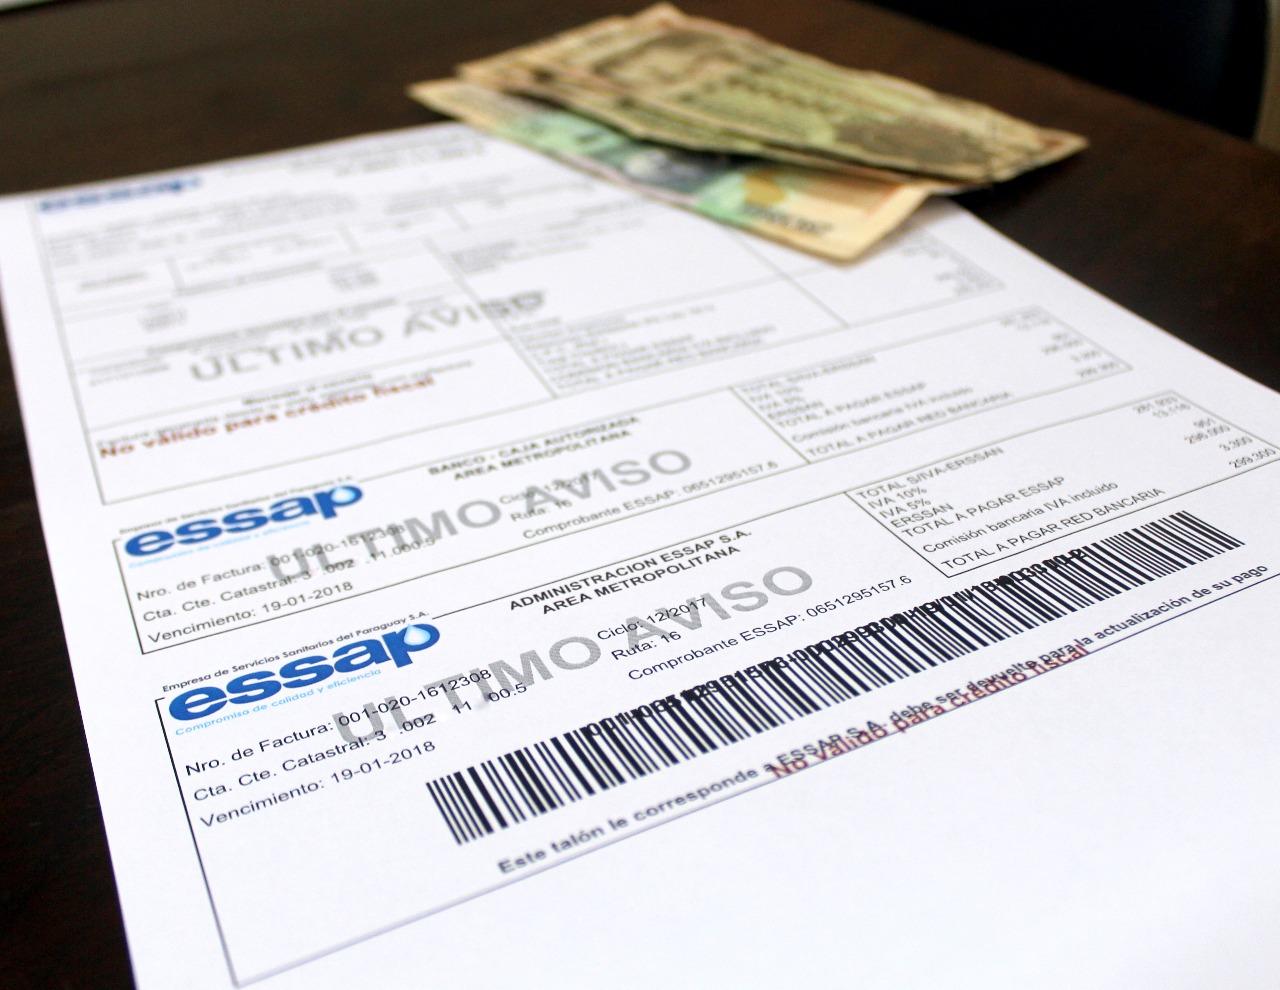 usuarios podrán consultar facturas de essap de manera online